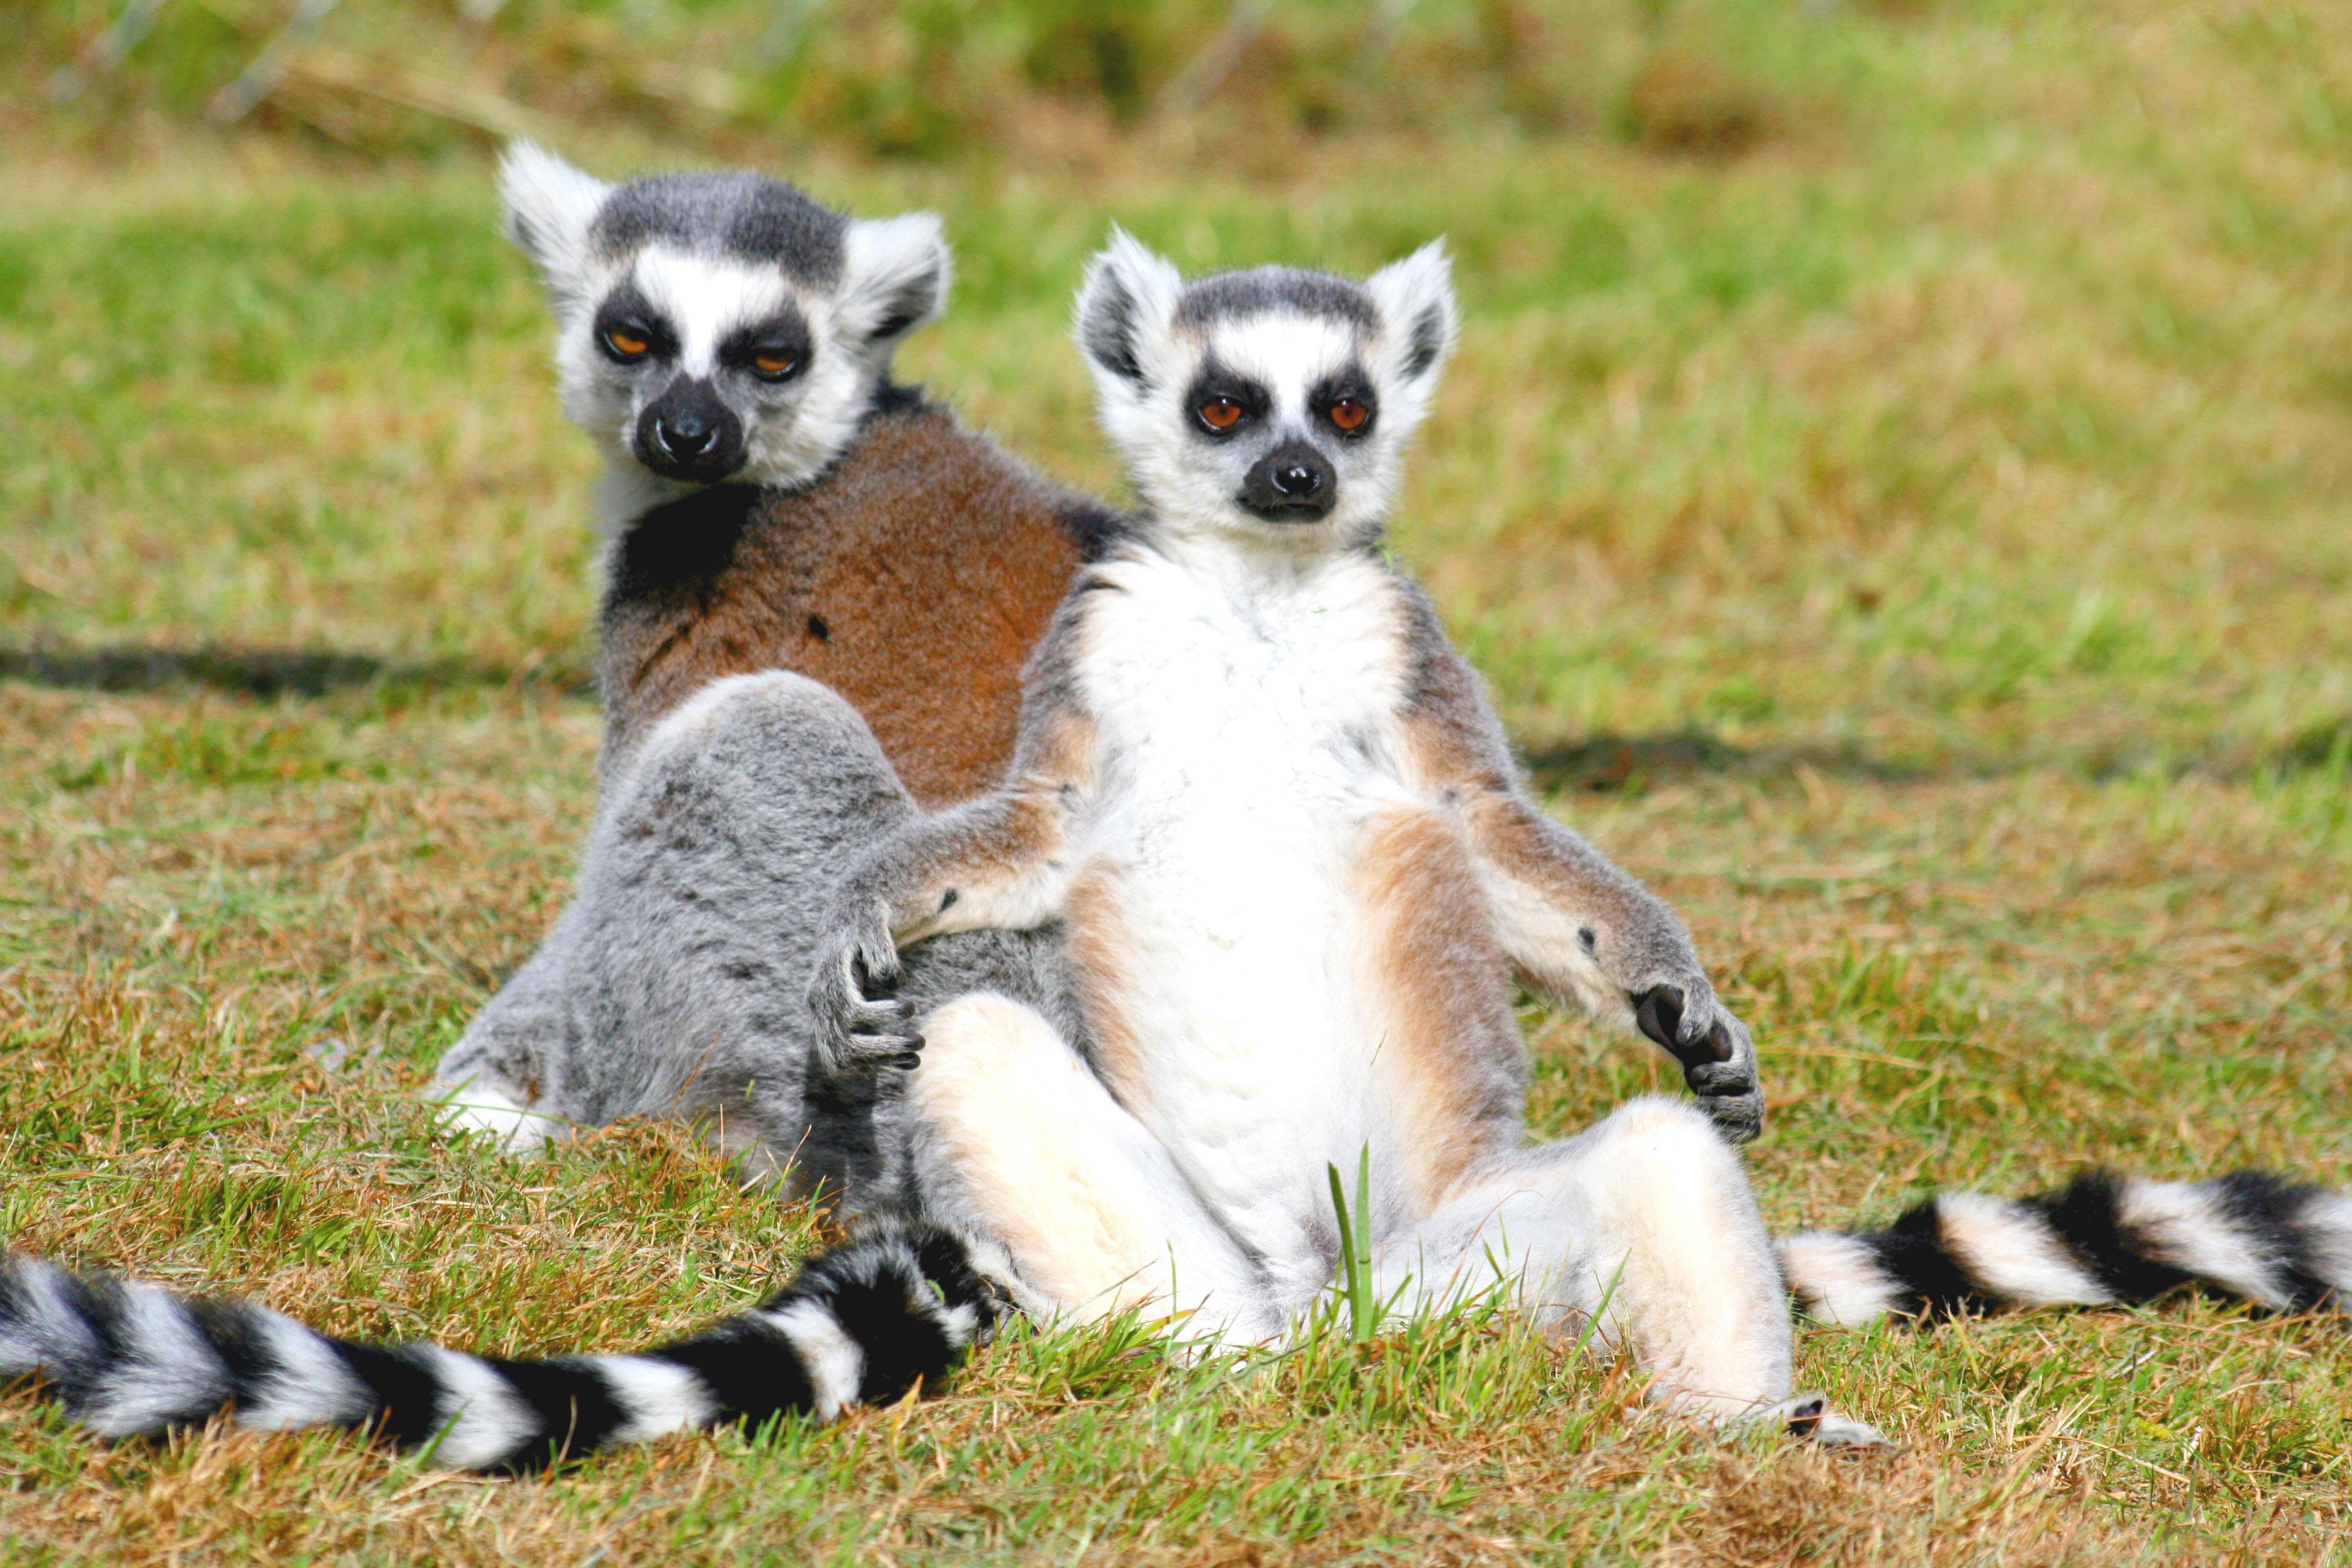 File:Ringtailed lemurs.jpg - Wikimedia Commons